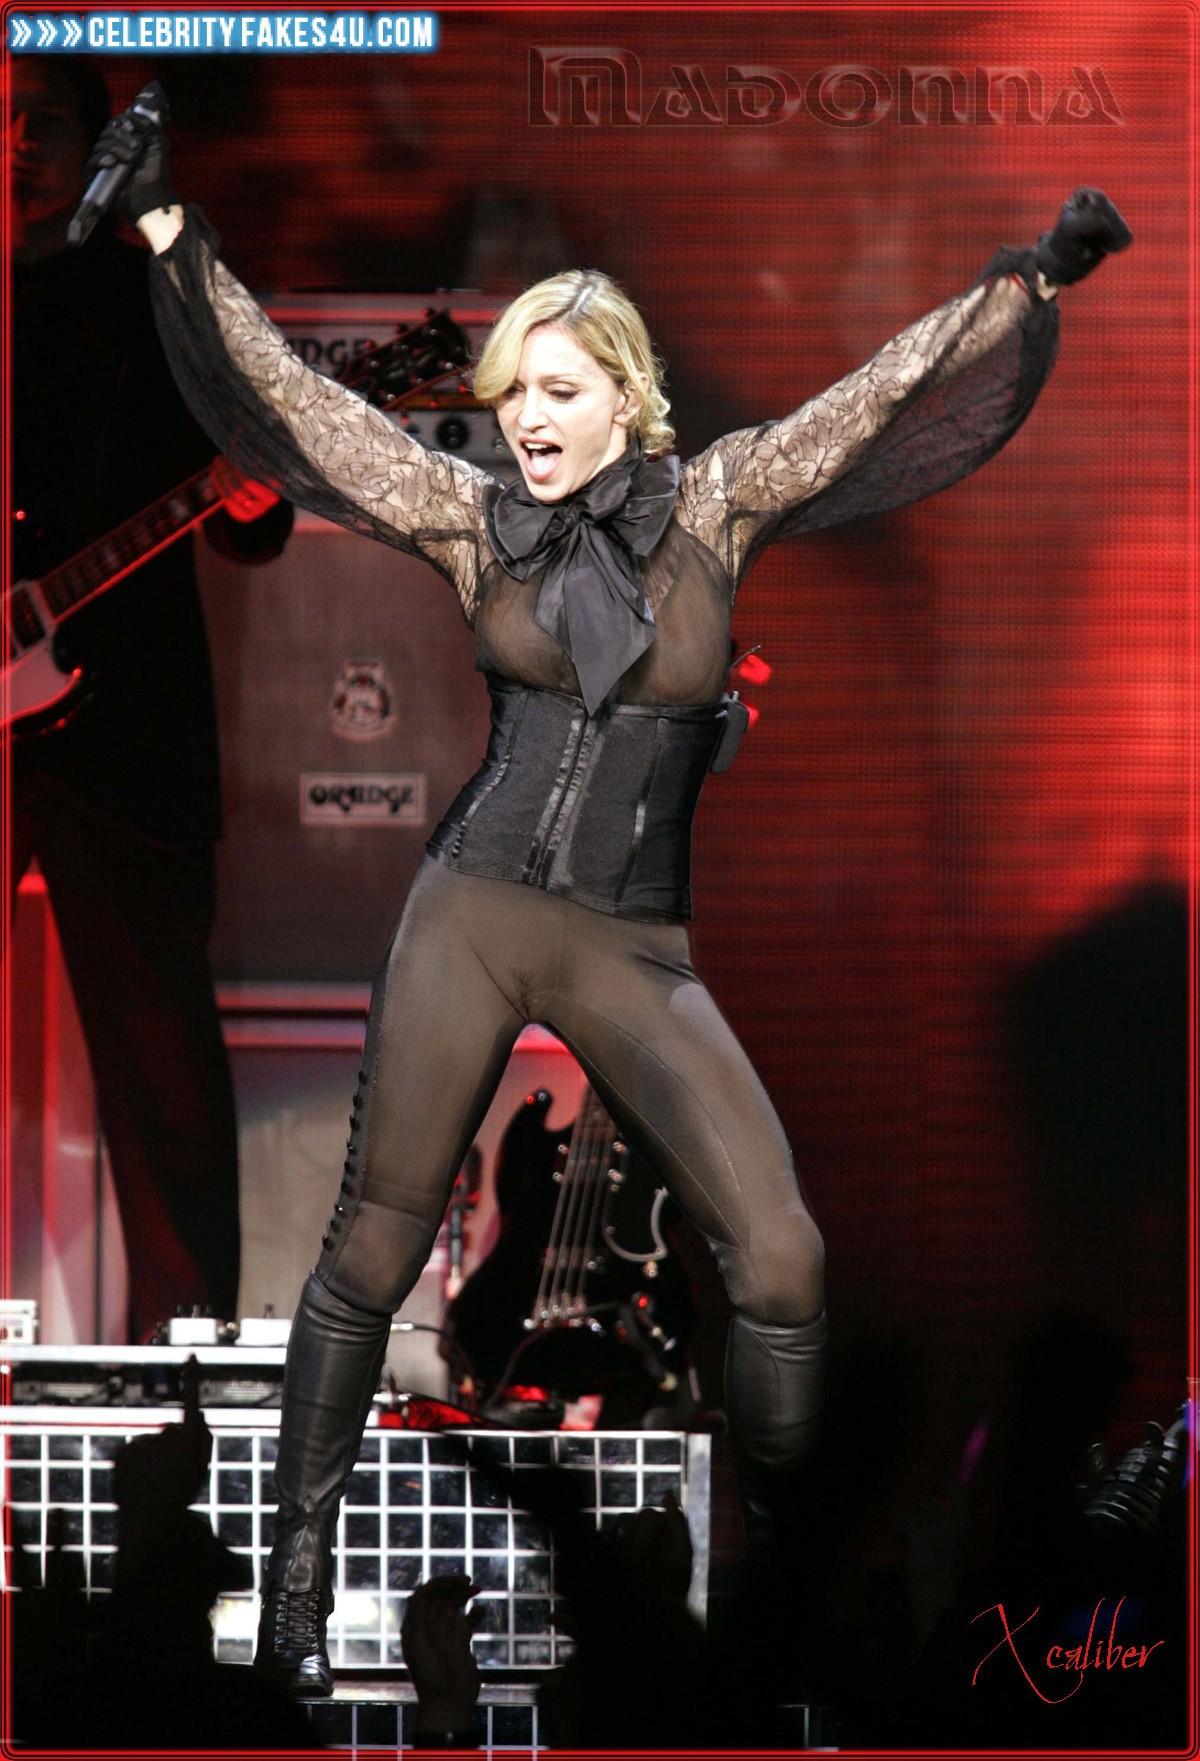 Madonna fake nude porn theme, interesting